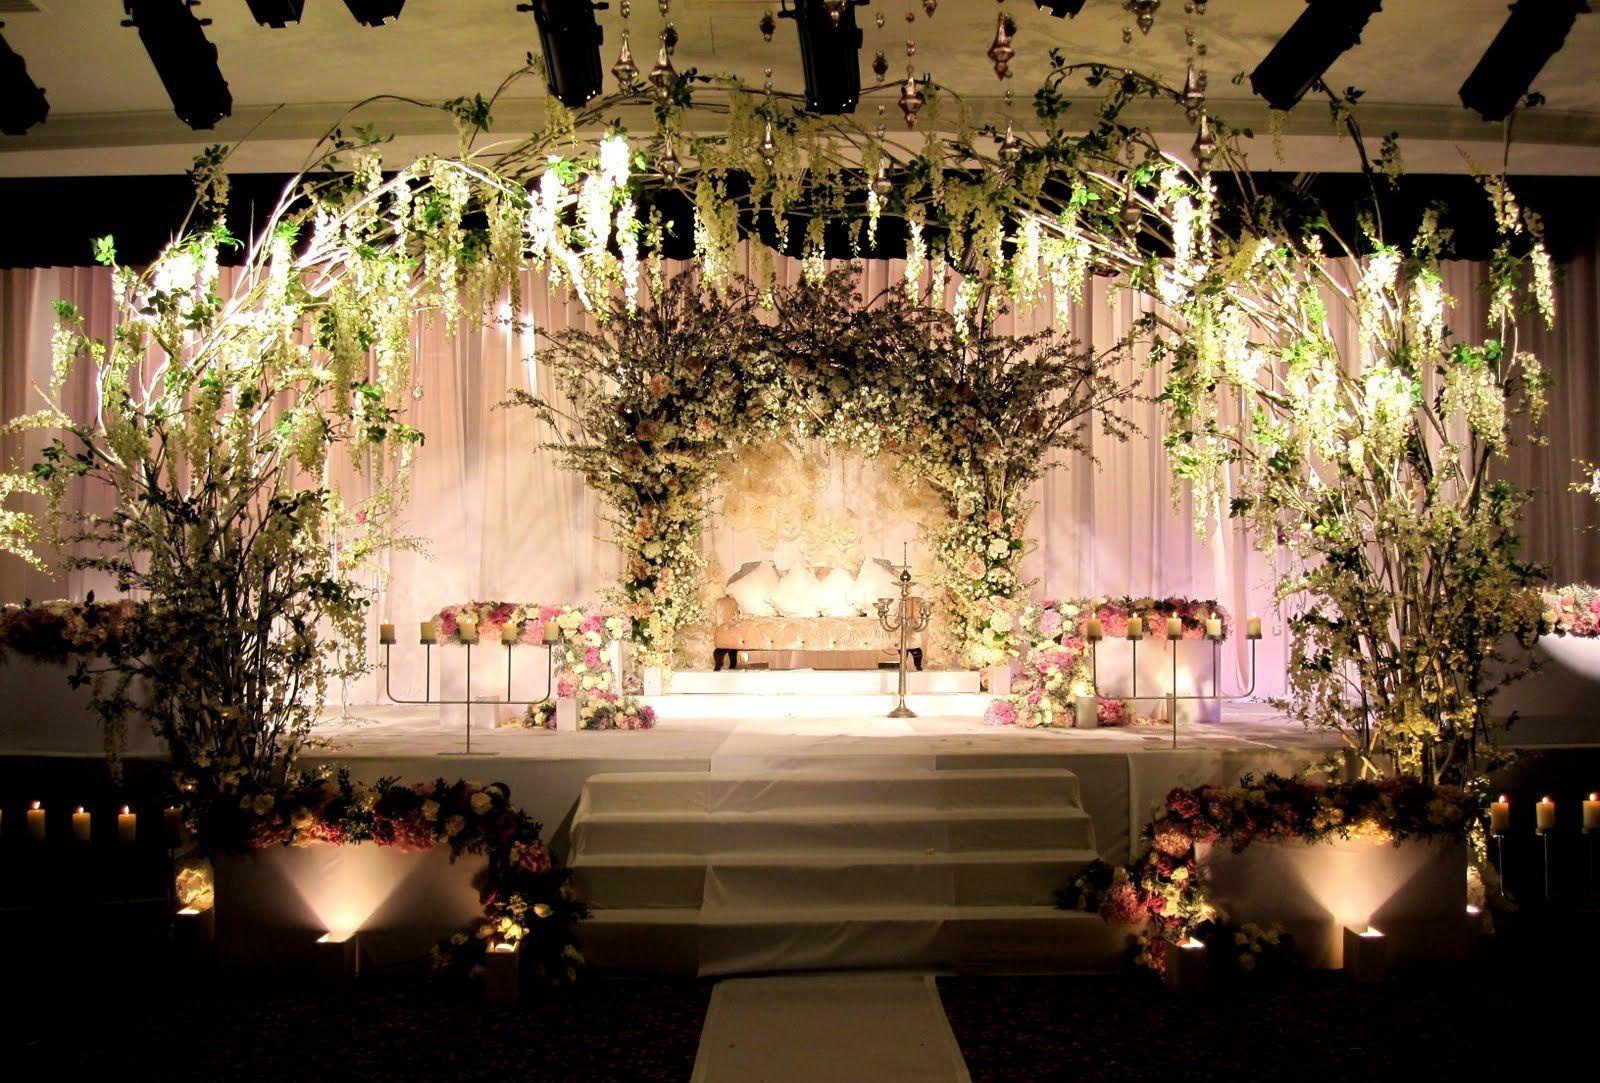 Wedding decoration flowers names 65oiebhrg 16001083 stage wedding decoration flowers names 65oiebhrg 16001083 stage pinterest stage junglespirit Choice Image